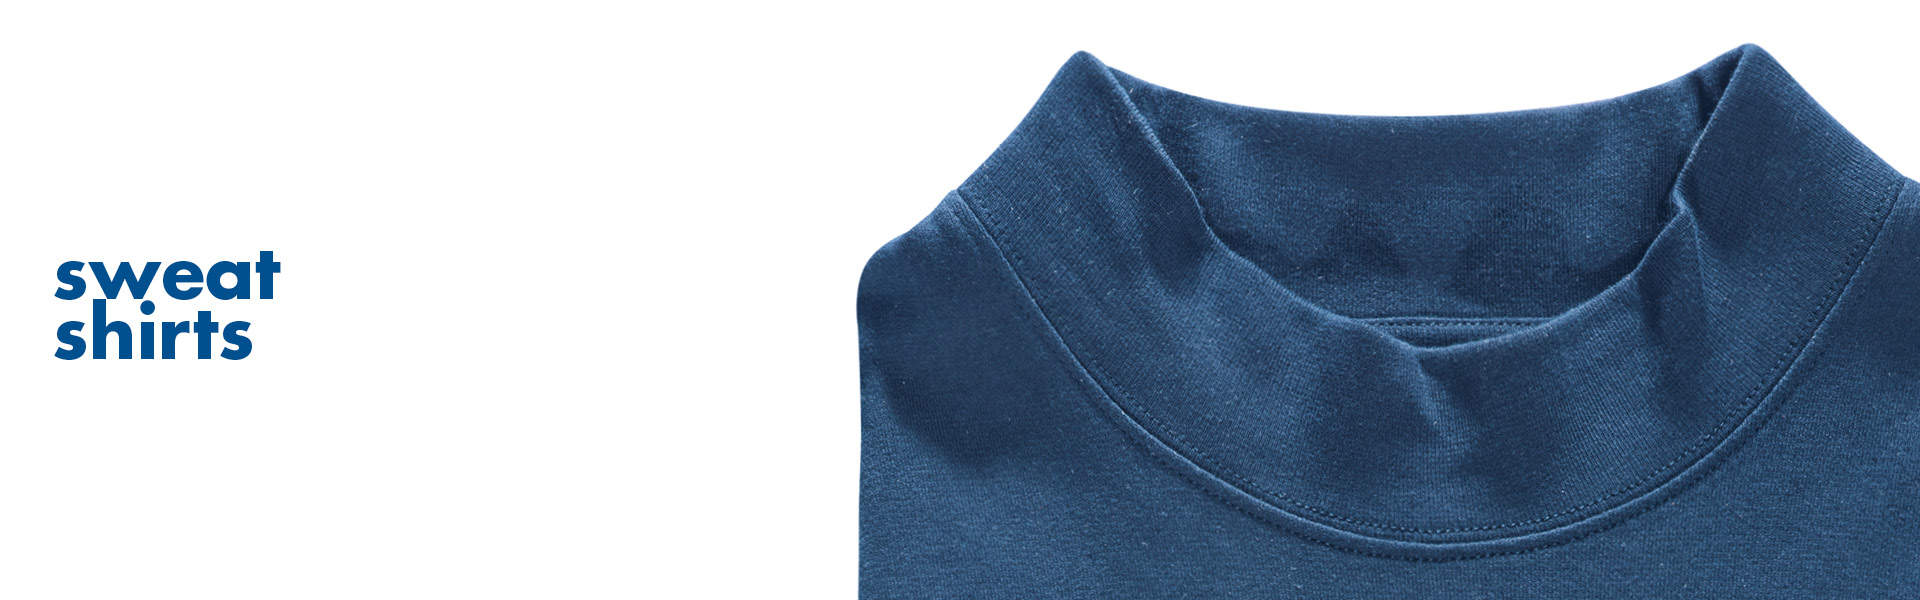 Sweatshirt slide 2